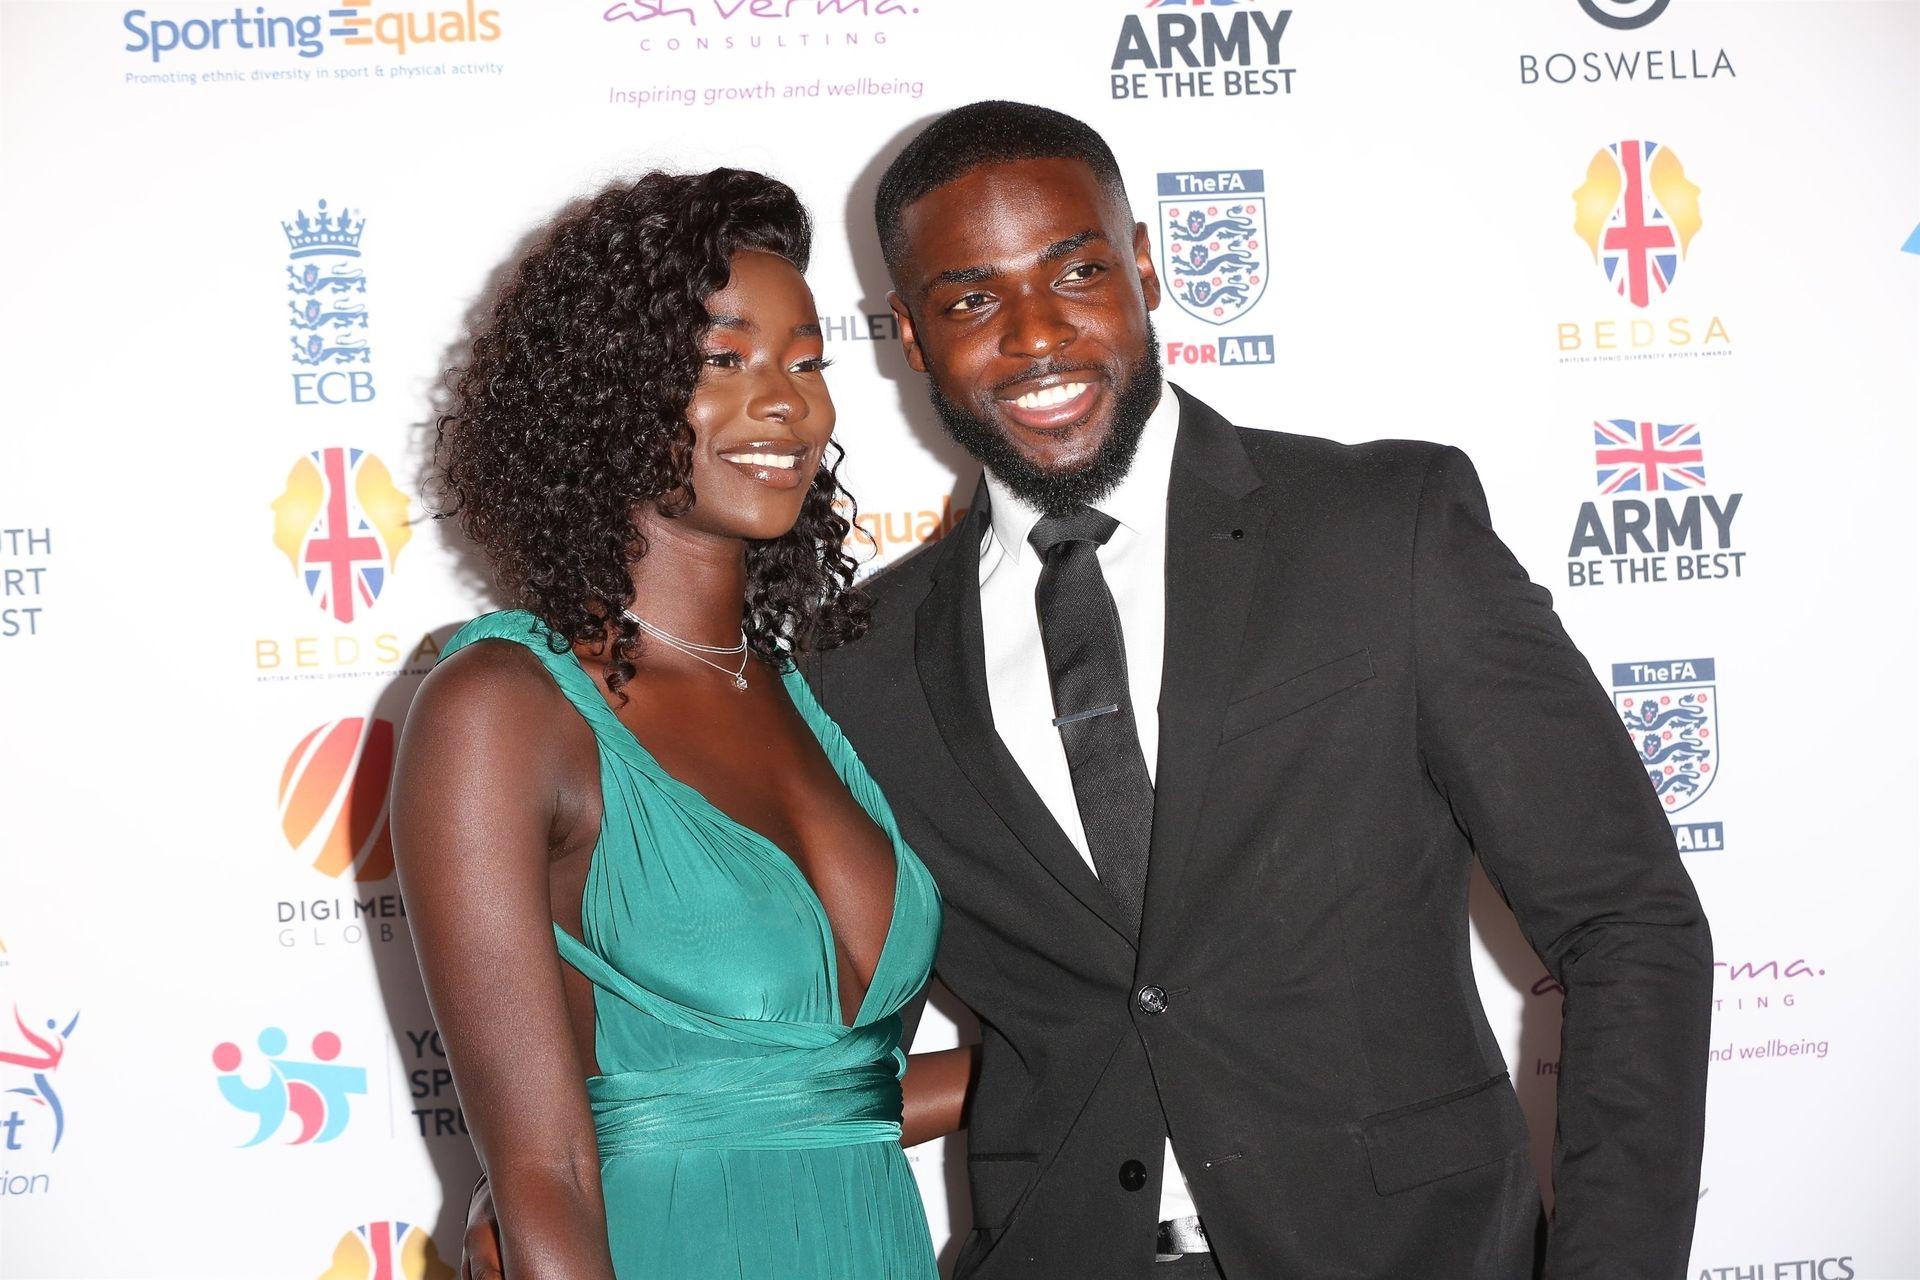 Mike Boateng & Priscilla Anyabu Are Seen At British Ethnic Diversity Sports Awards 0012